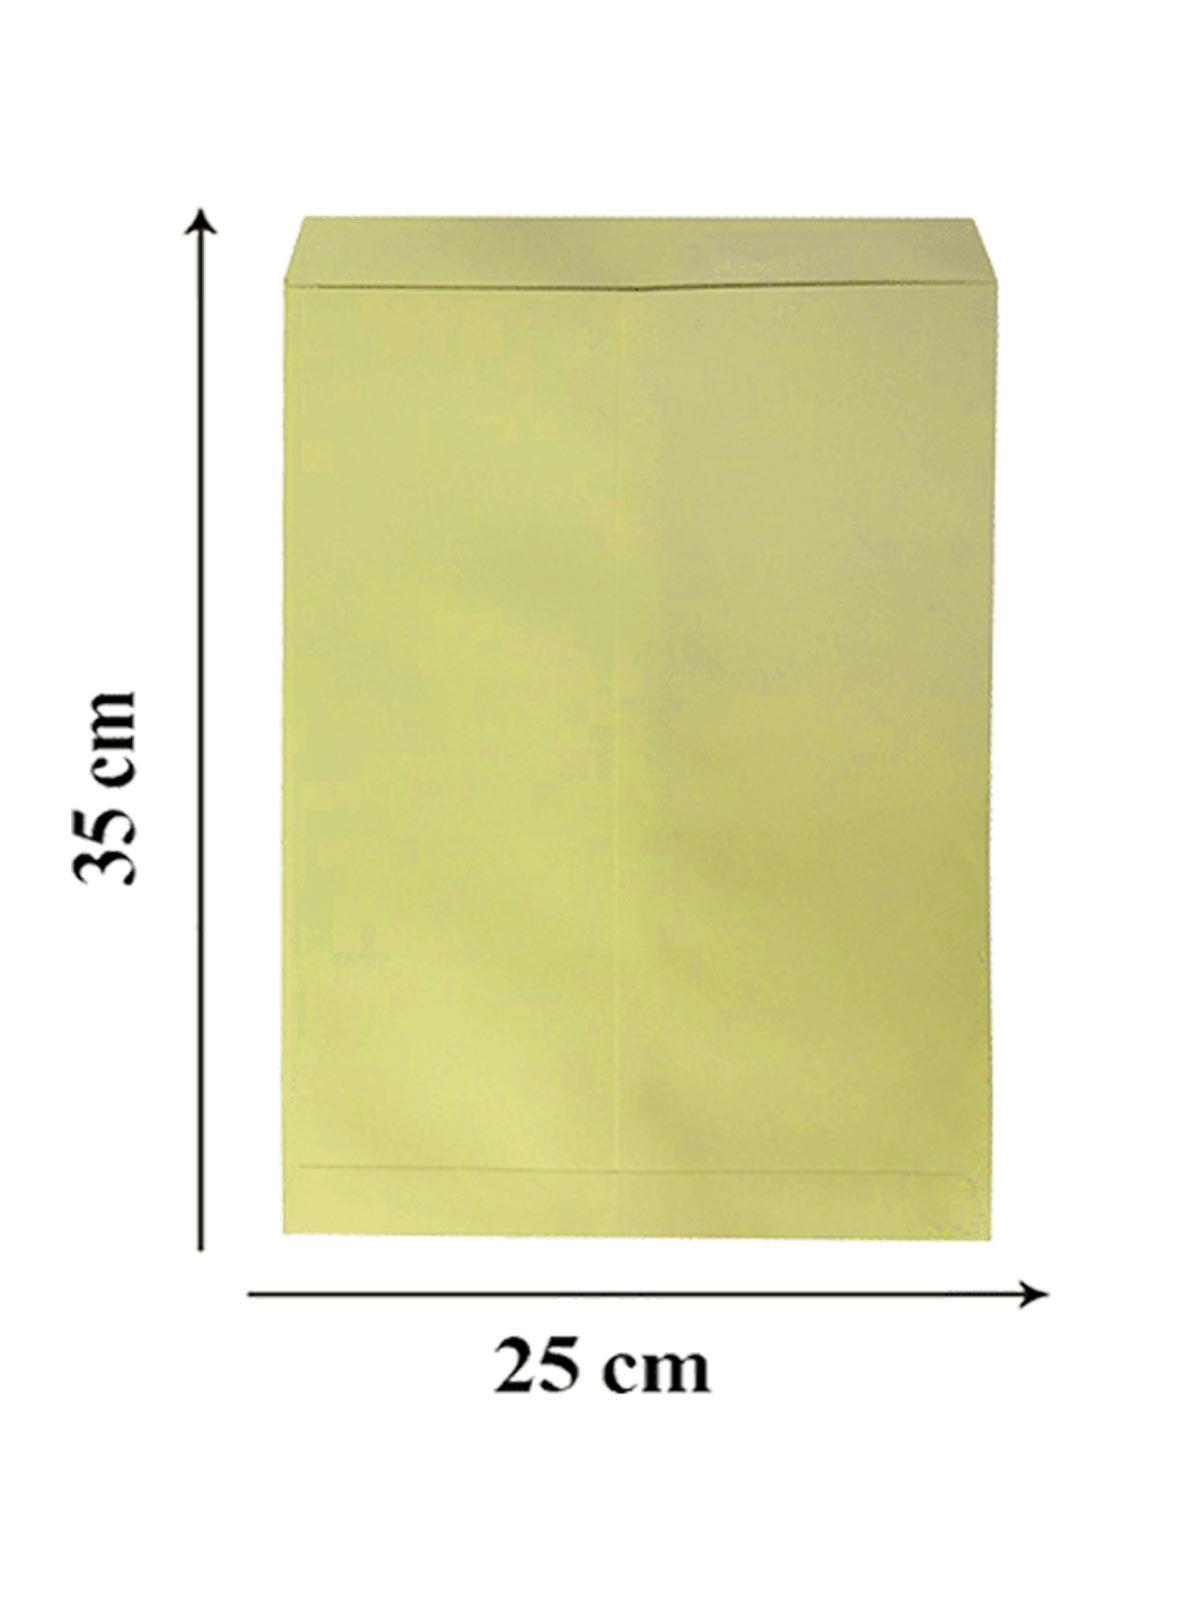 پاکت زرد سایز A4